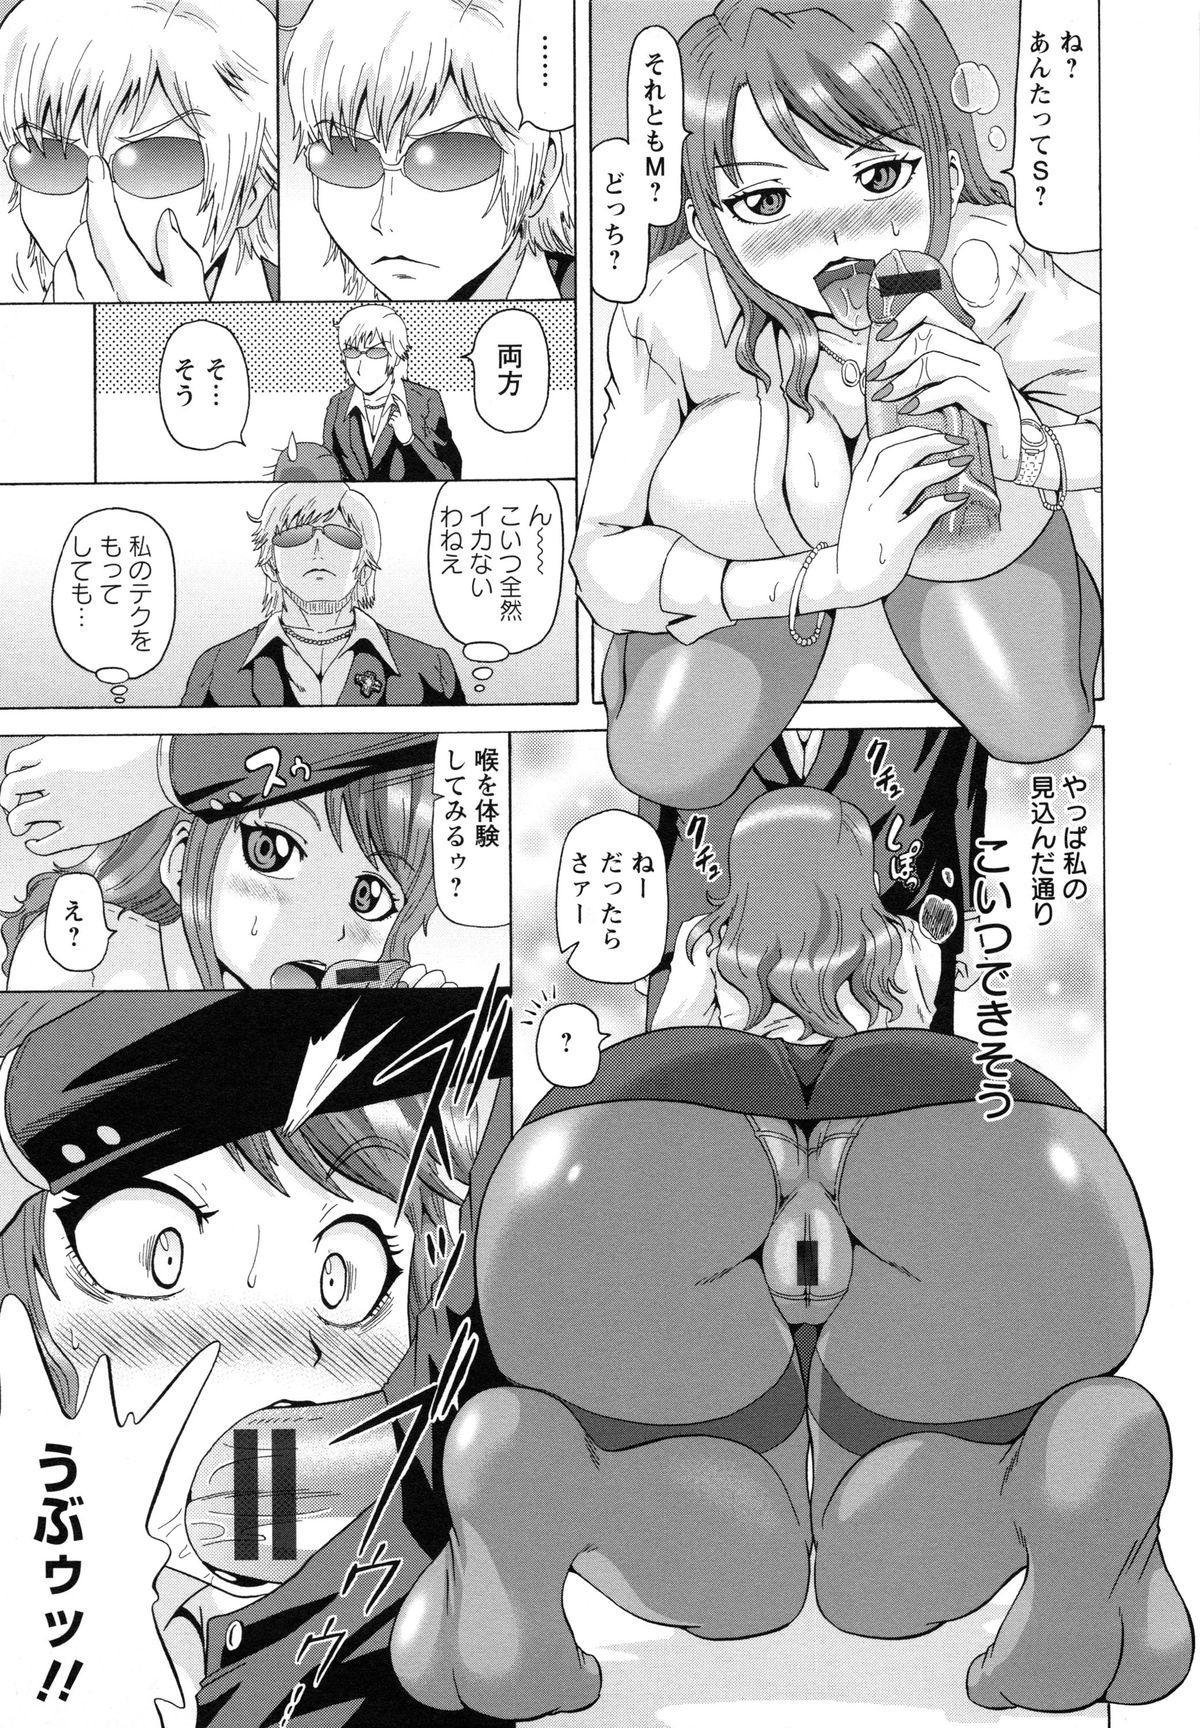 [Nukunuku Orange] Seikou ~Maeana Kanzen Houchi~ - Keep Anus in Anguish!!!! 118